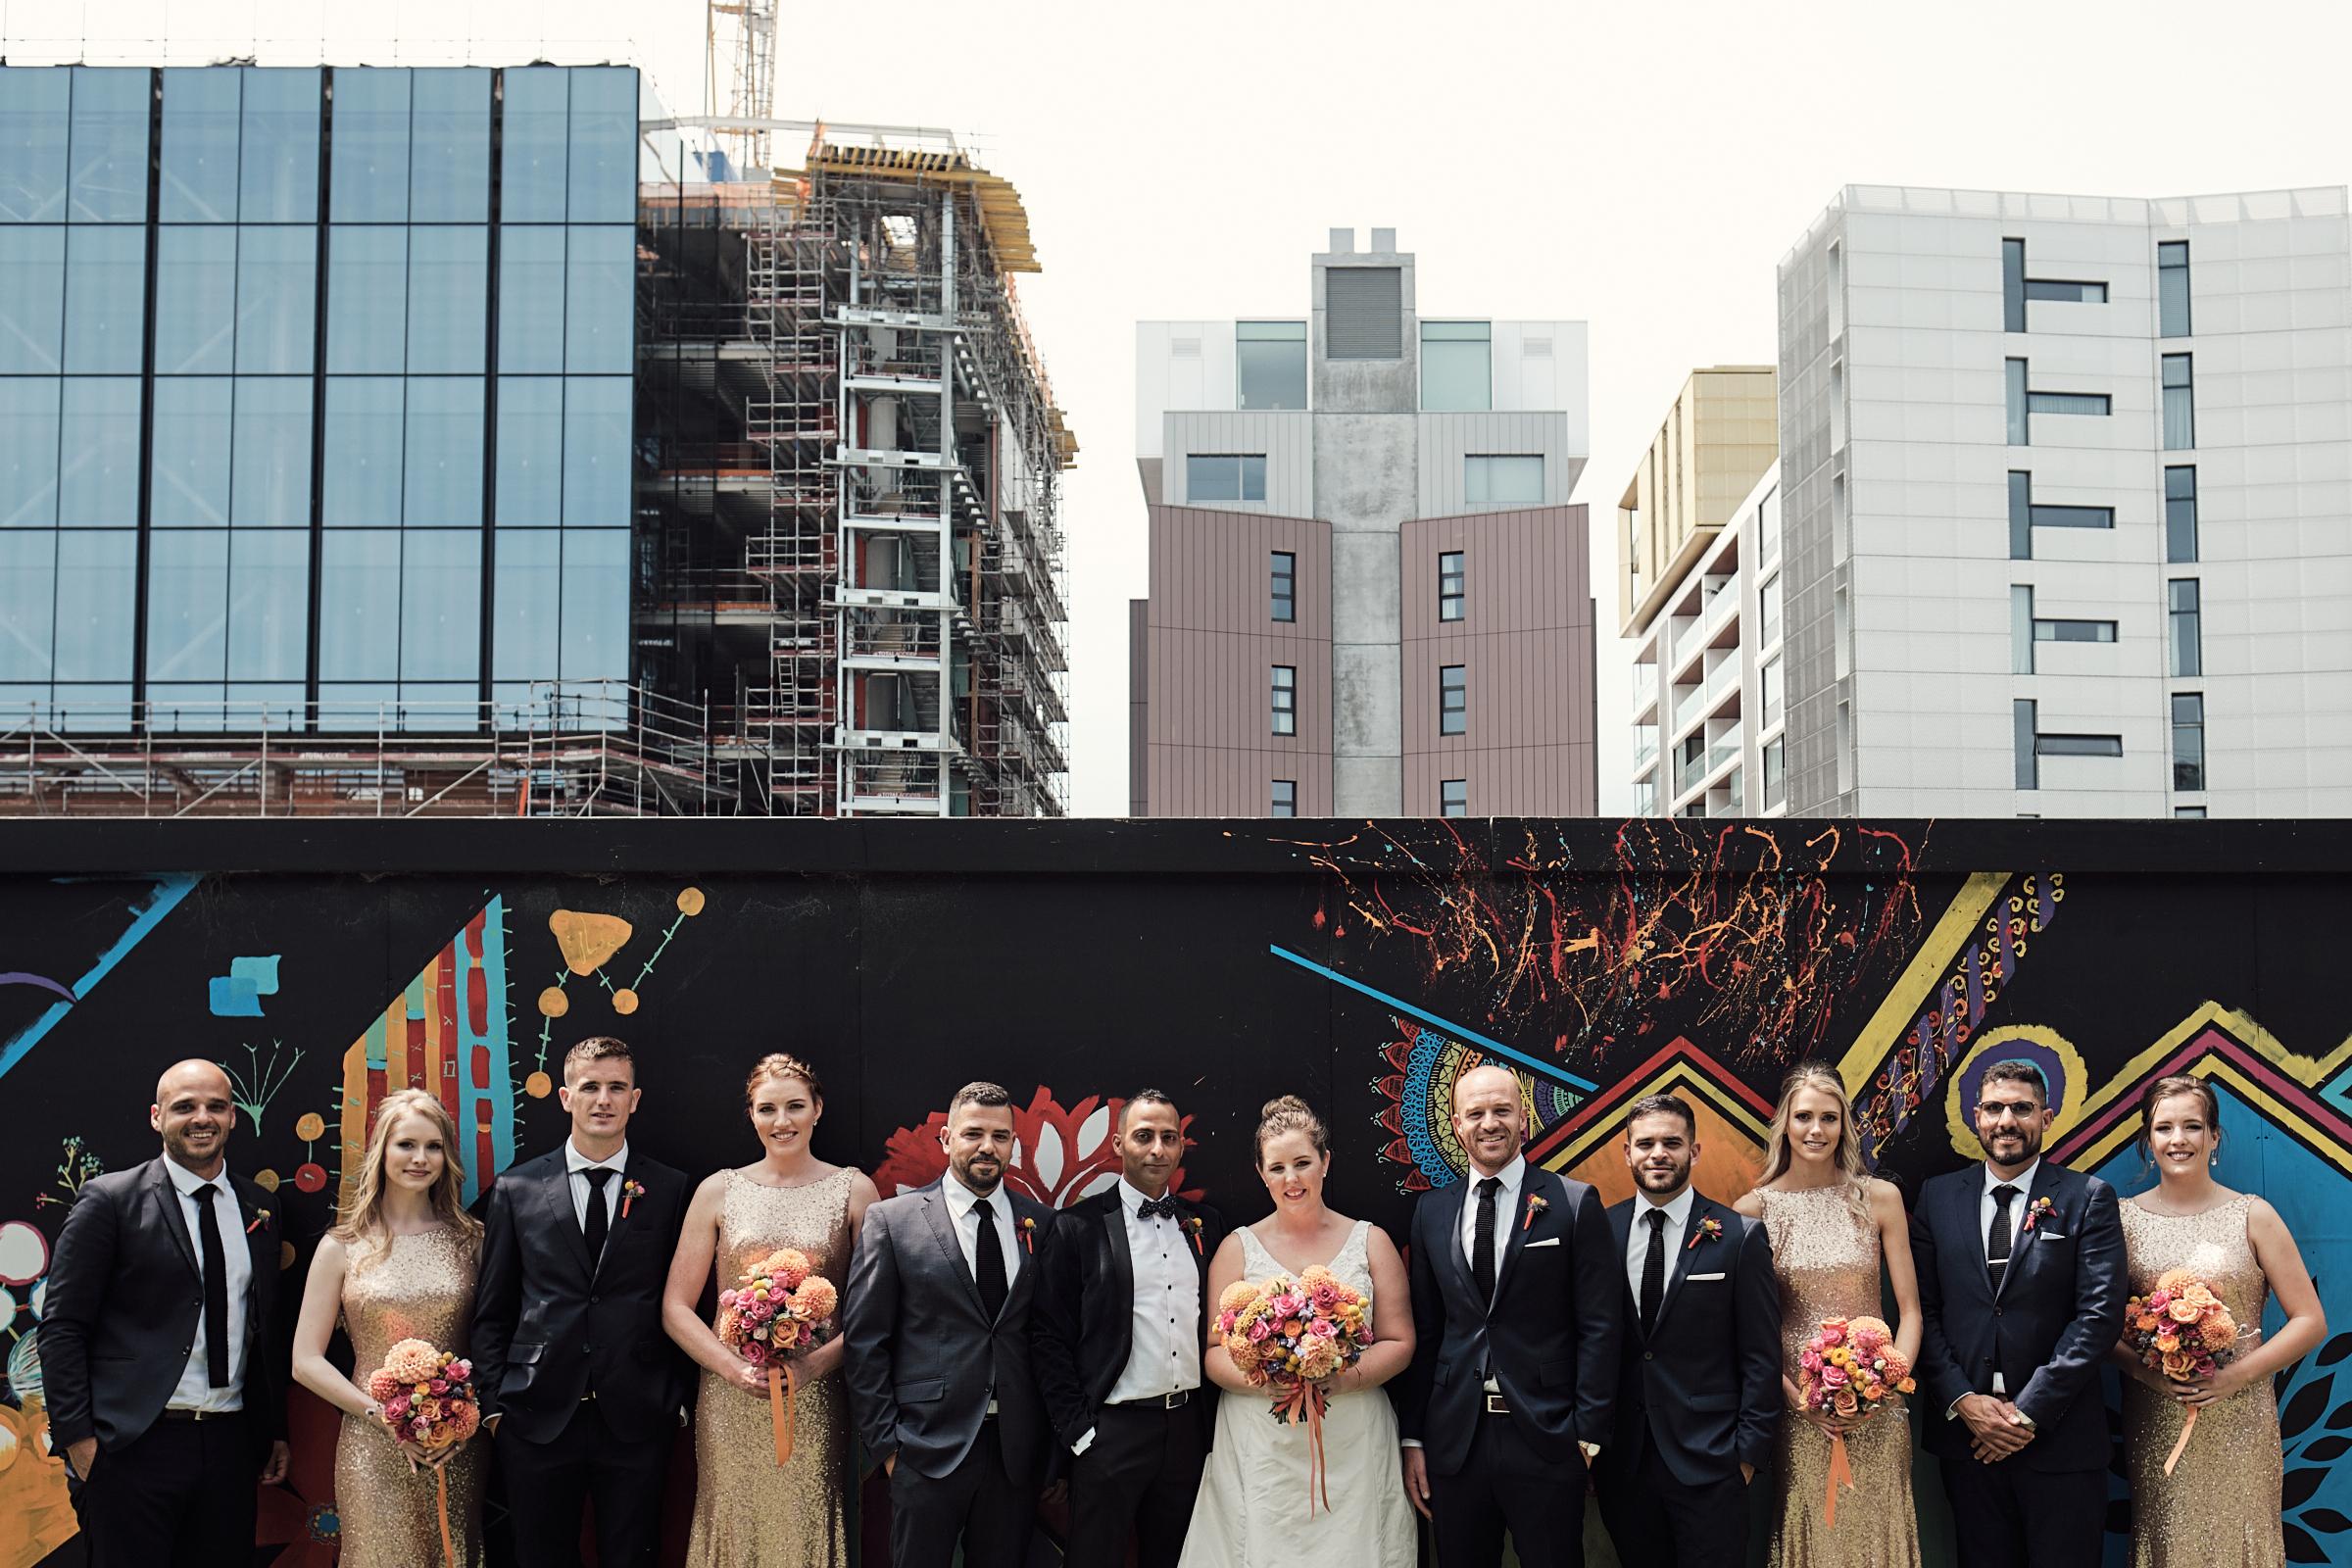 Great wedding photographers